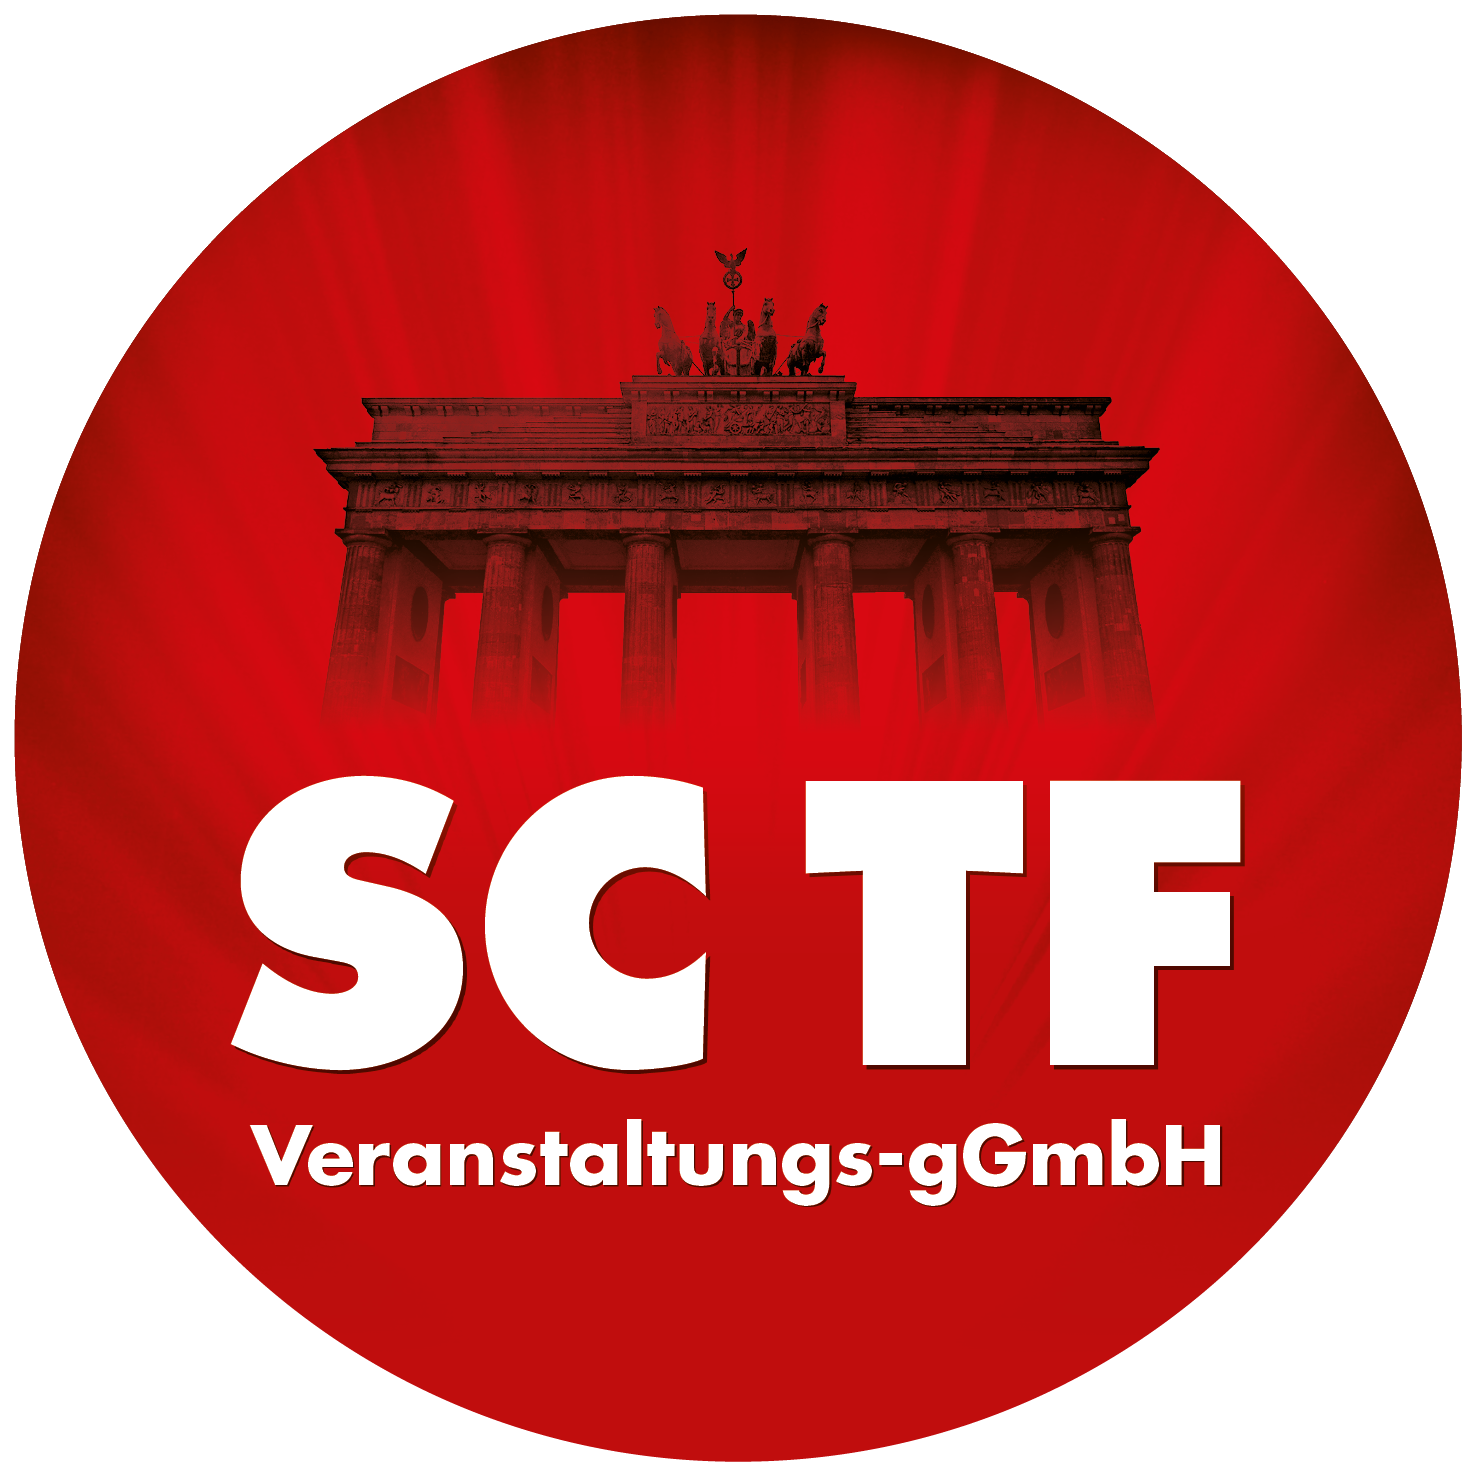 SC TF Veranstaltungs-gGmbH Logo